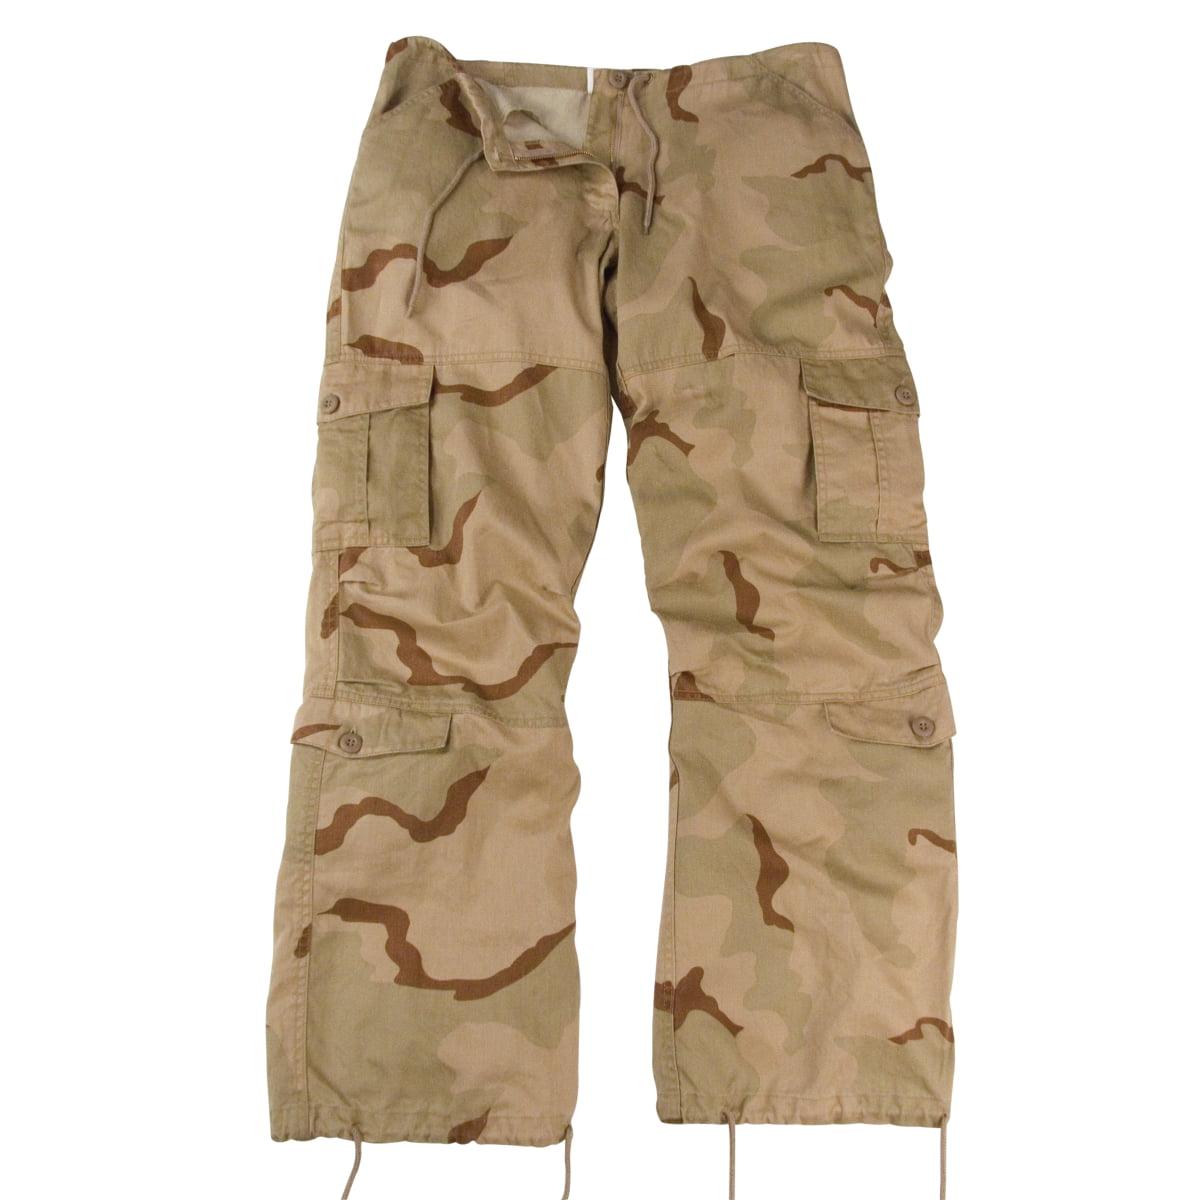 Rothco Women's Desert Camo Vintage Paratrooper Cargo Pants